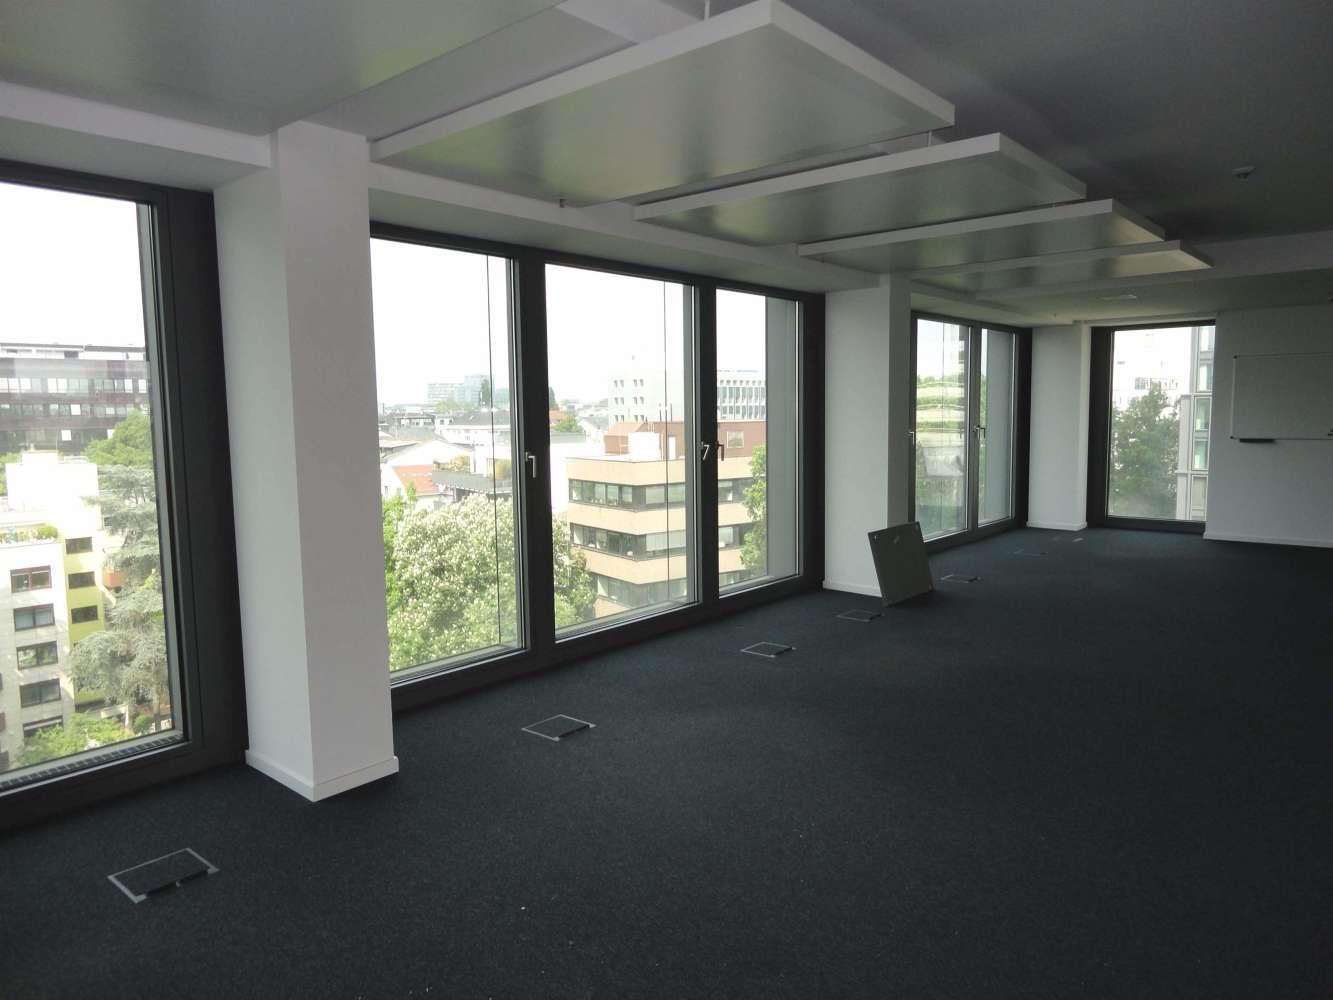 Büros Frankfurt am main, 60325 - Büro - Frankfurt am Main, Westend - F1068 - 10043866